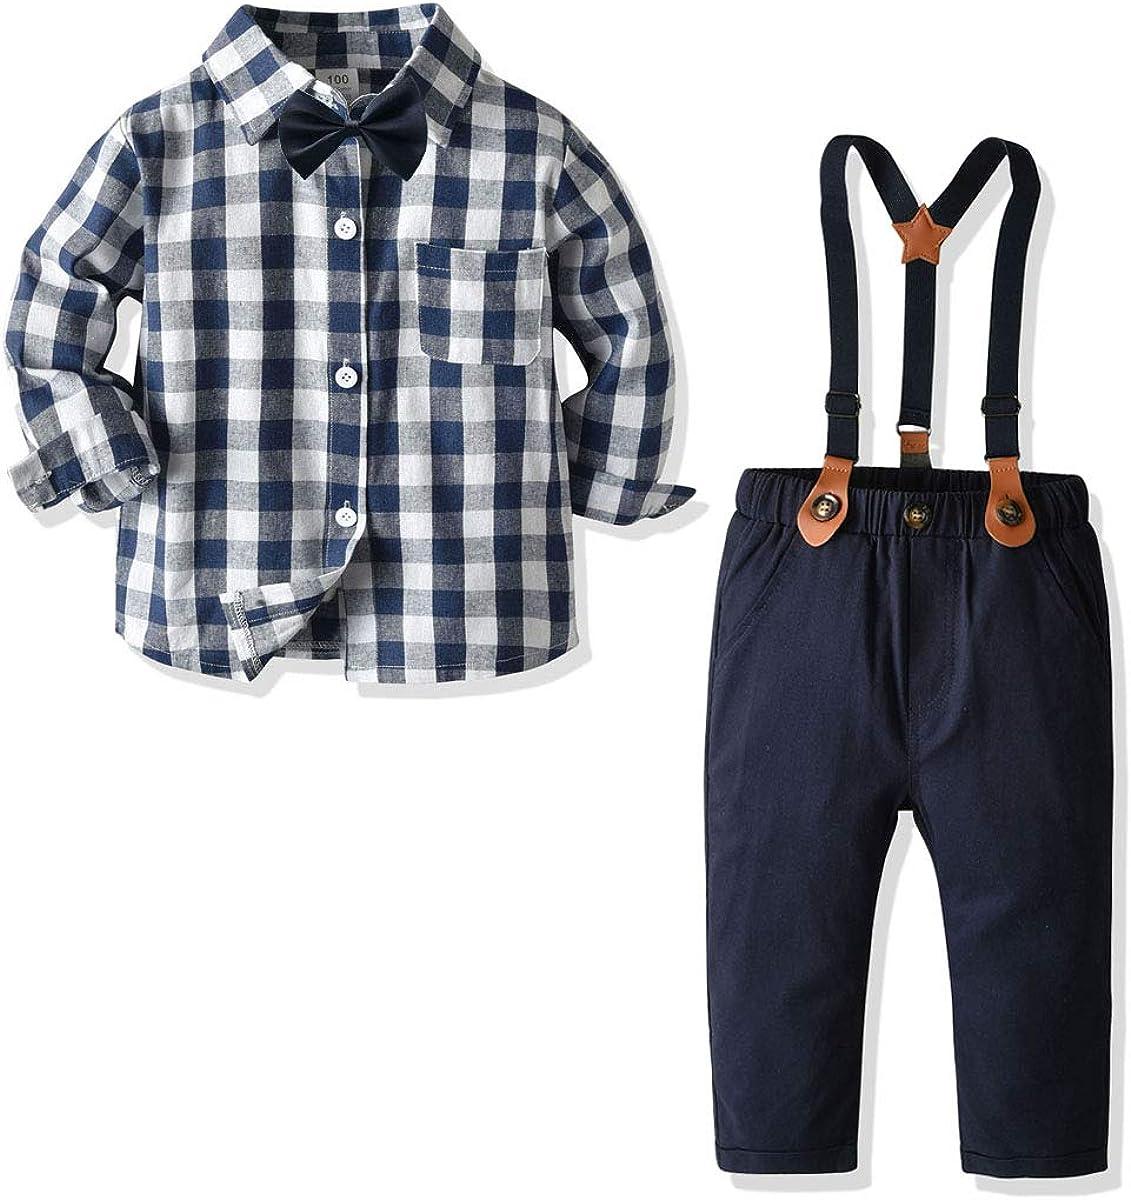 Little Boys Gentleman Set Baby Boys Button Down Outfit Long Sleeve Shirt+Suspenders Pants+Bow Tie 4Pcs Set 2-7Y